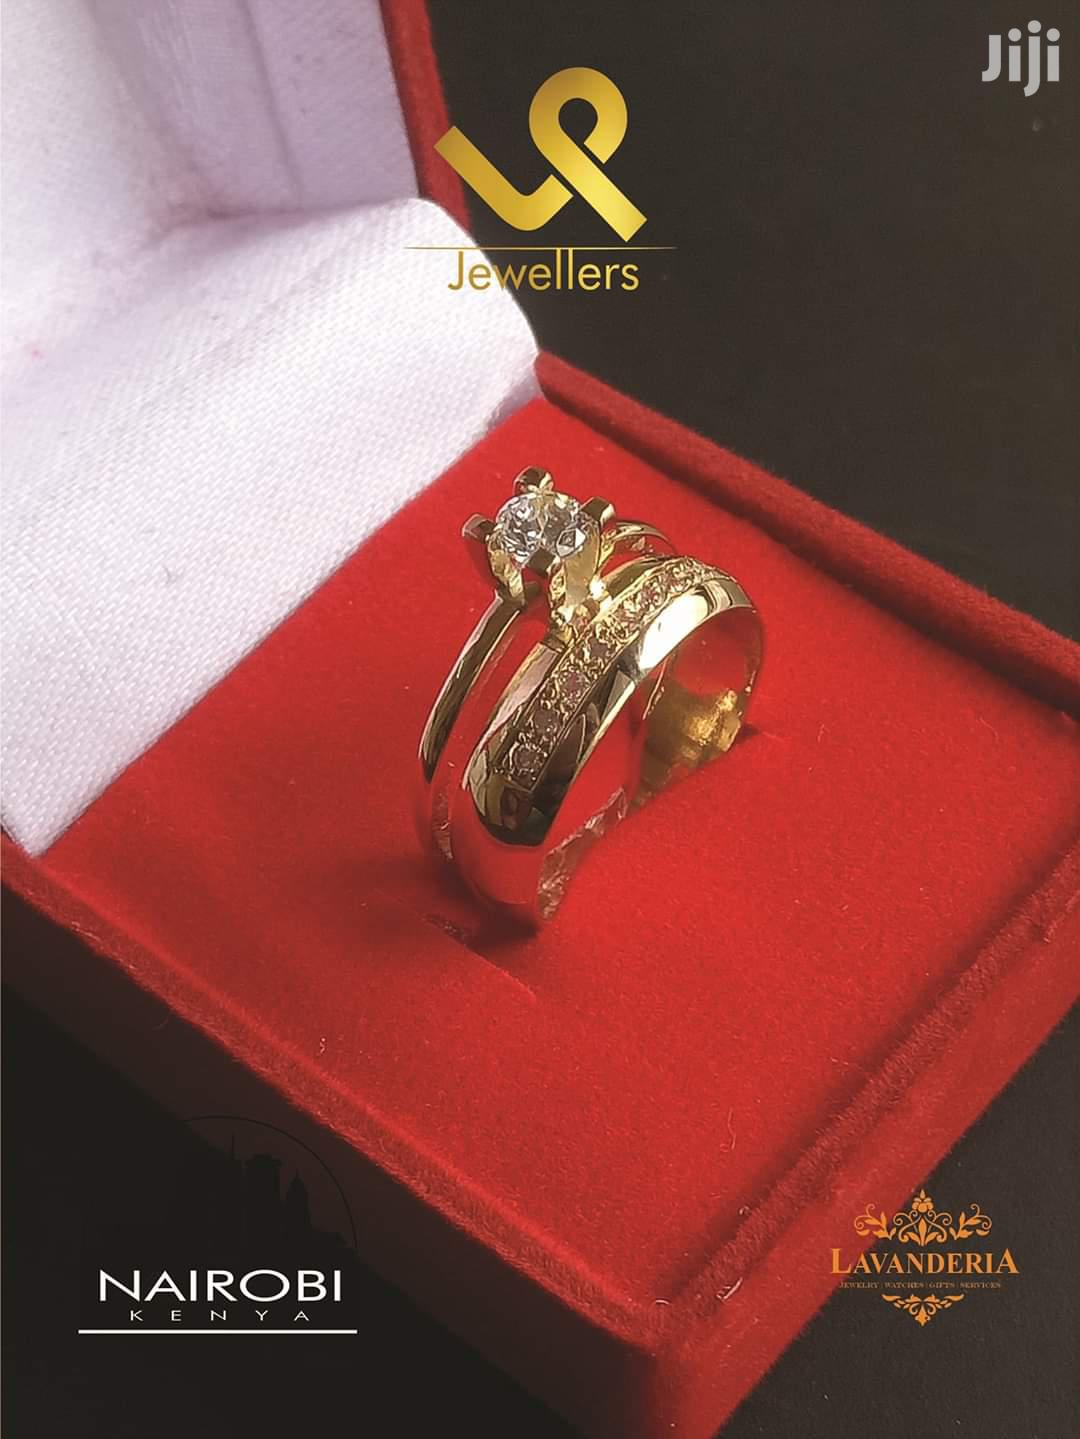 18k Gold Custom Made Bride N Groom Wedding Bands Ring.   Wedding Wear & Accessories for sale in Nairobi Central, Nairobi, Kenya